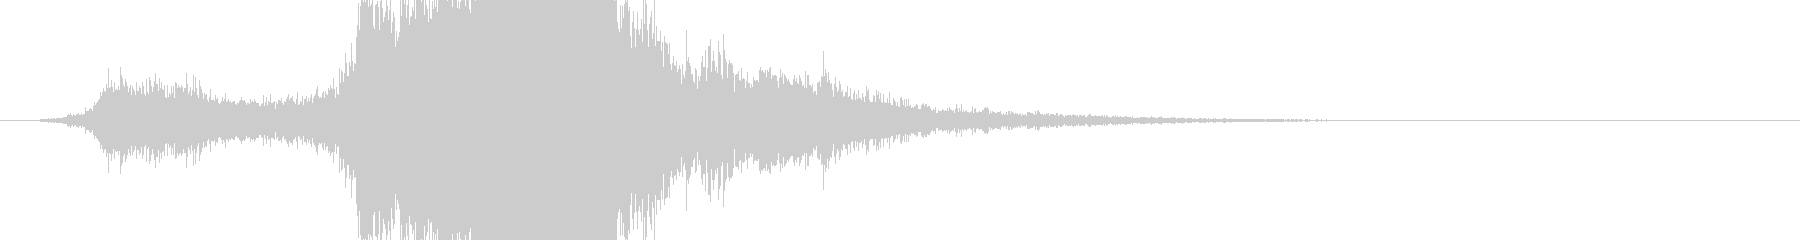 RPG系魔法イメージ音06 風の未再生の波形